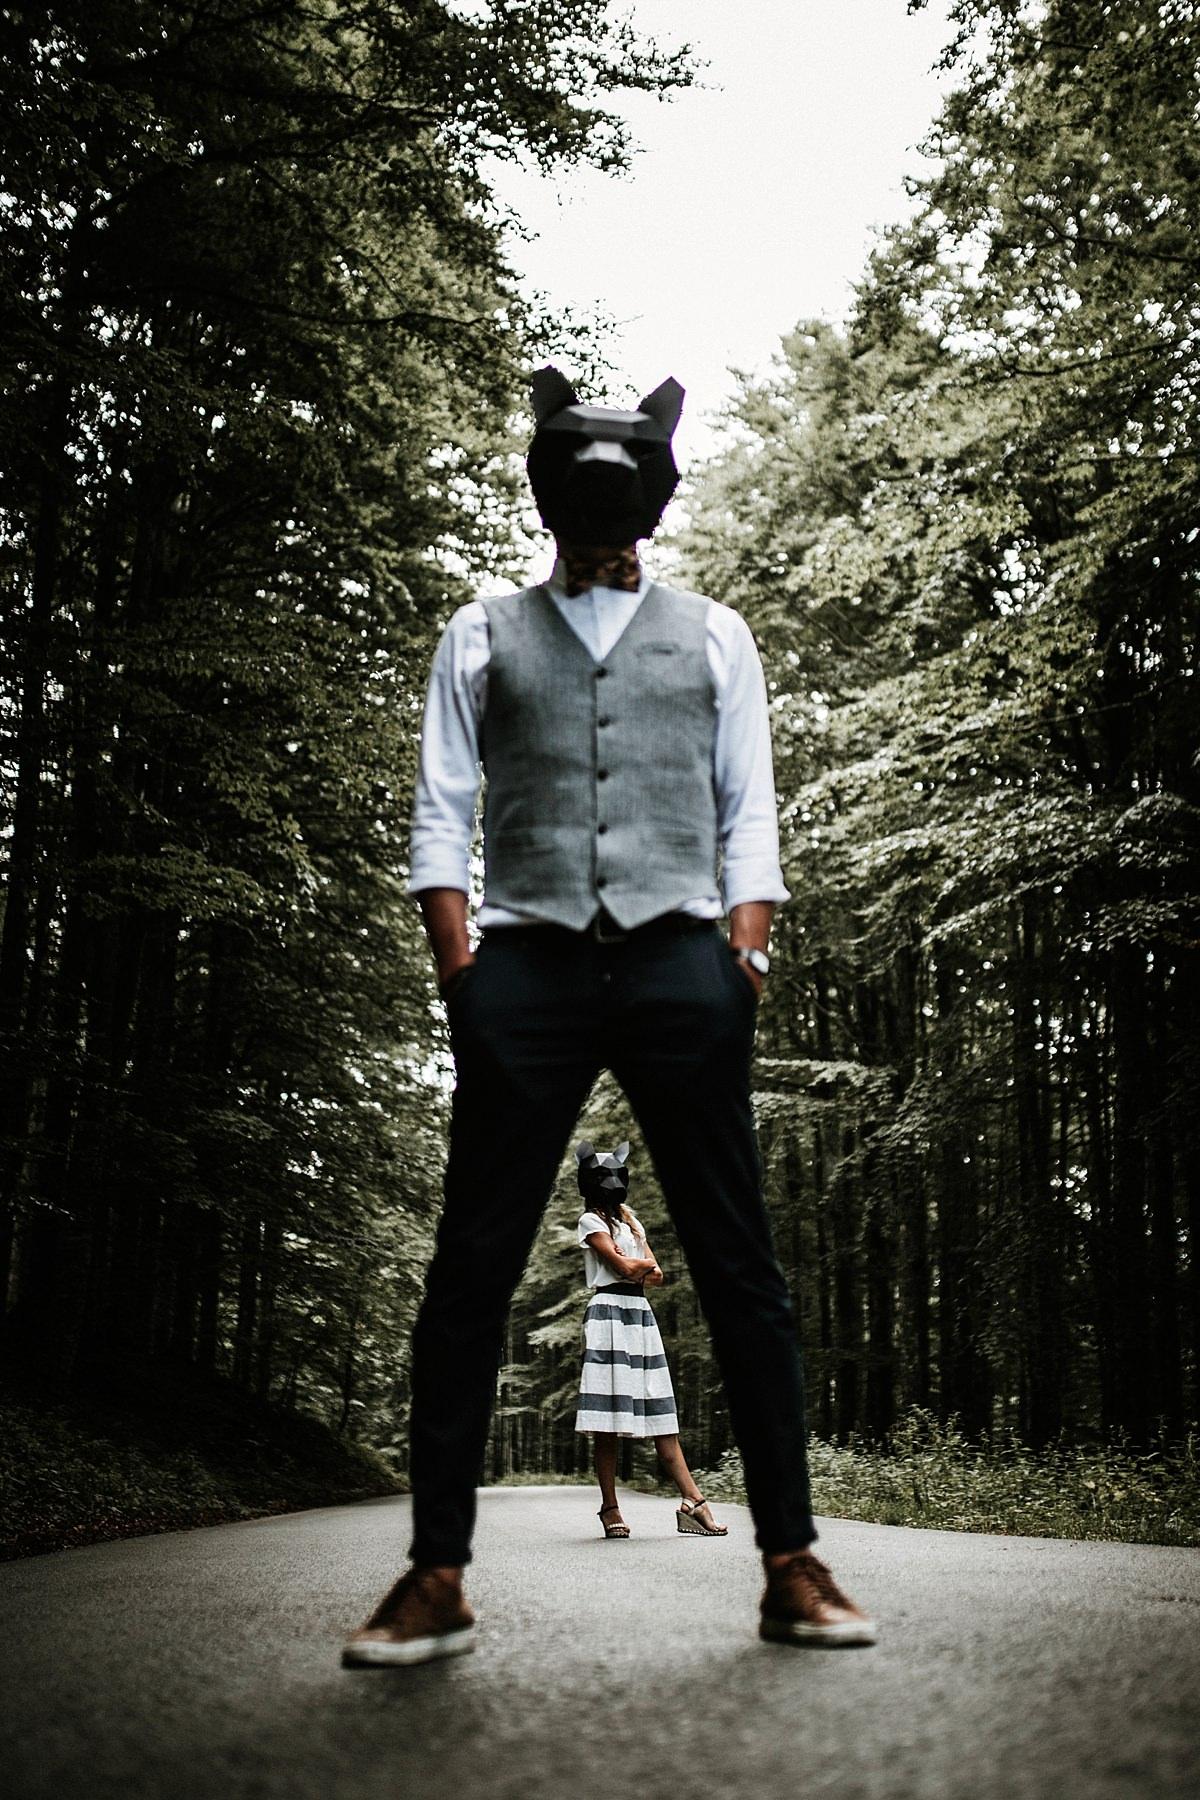 daniele-padovan-maschere-geometriche-animali_0031